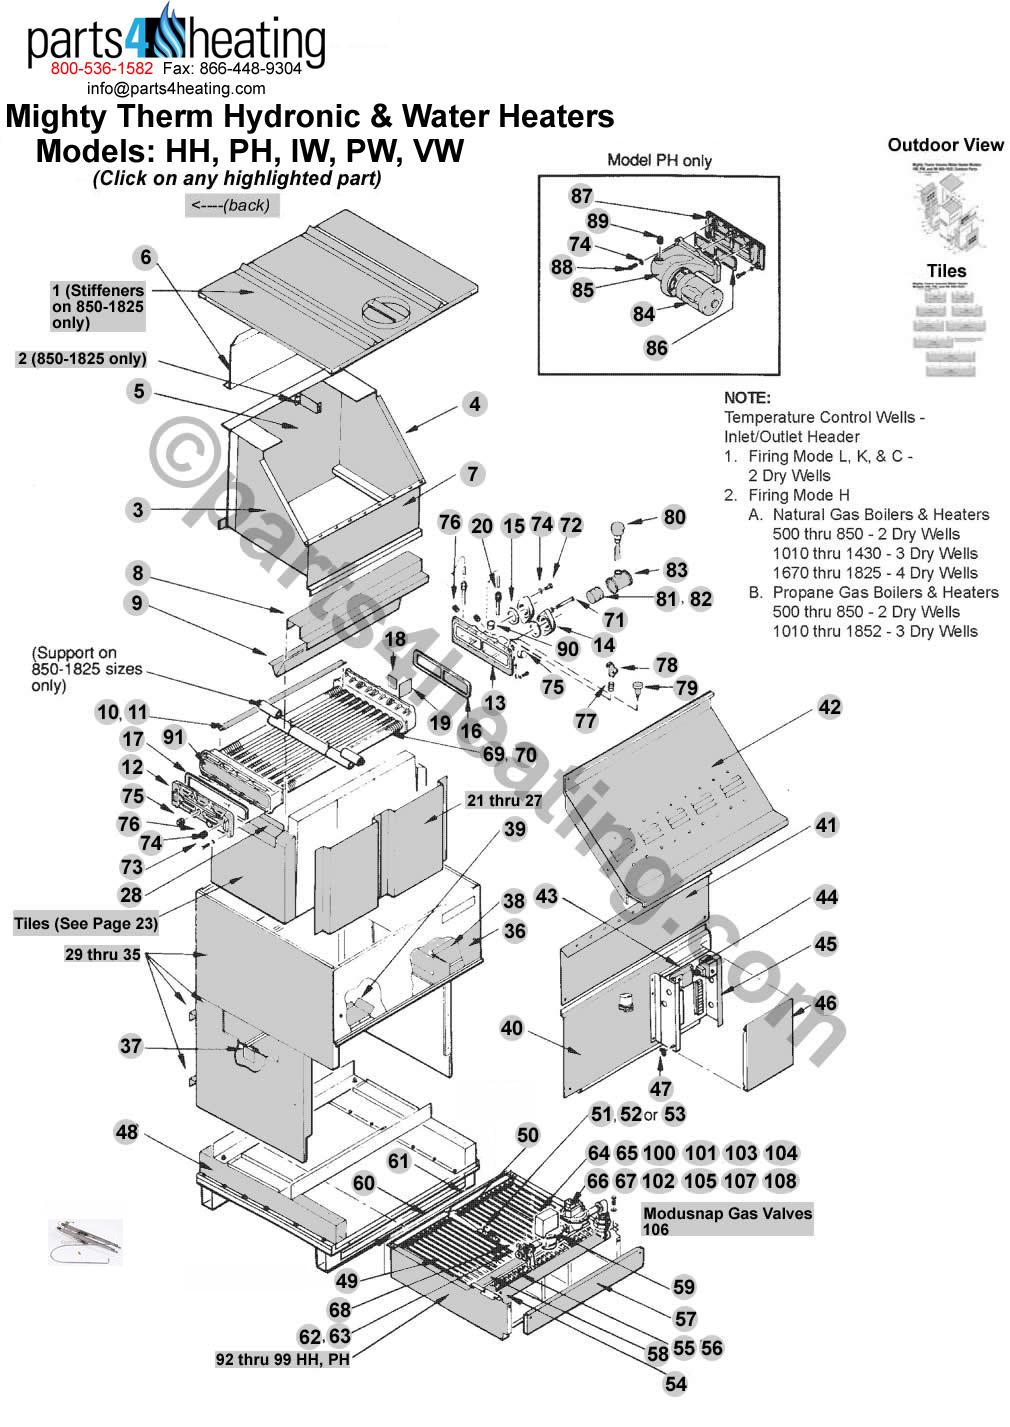 10 pin gentex gntx 313 pole barn wire diagram can am wire harness Gentex 455 Wiring gentex 10 pin connector Gentex Mirror Wiring Diagram Forum on gentex 313 10 pin wiring diagram